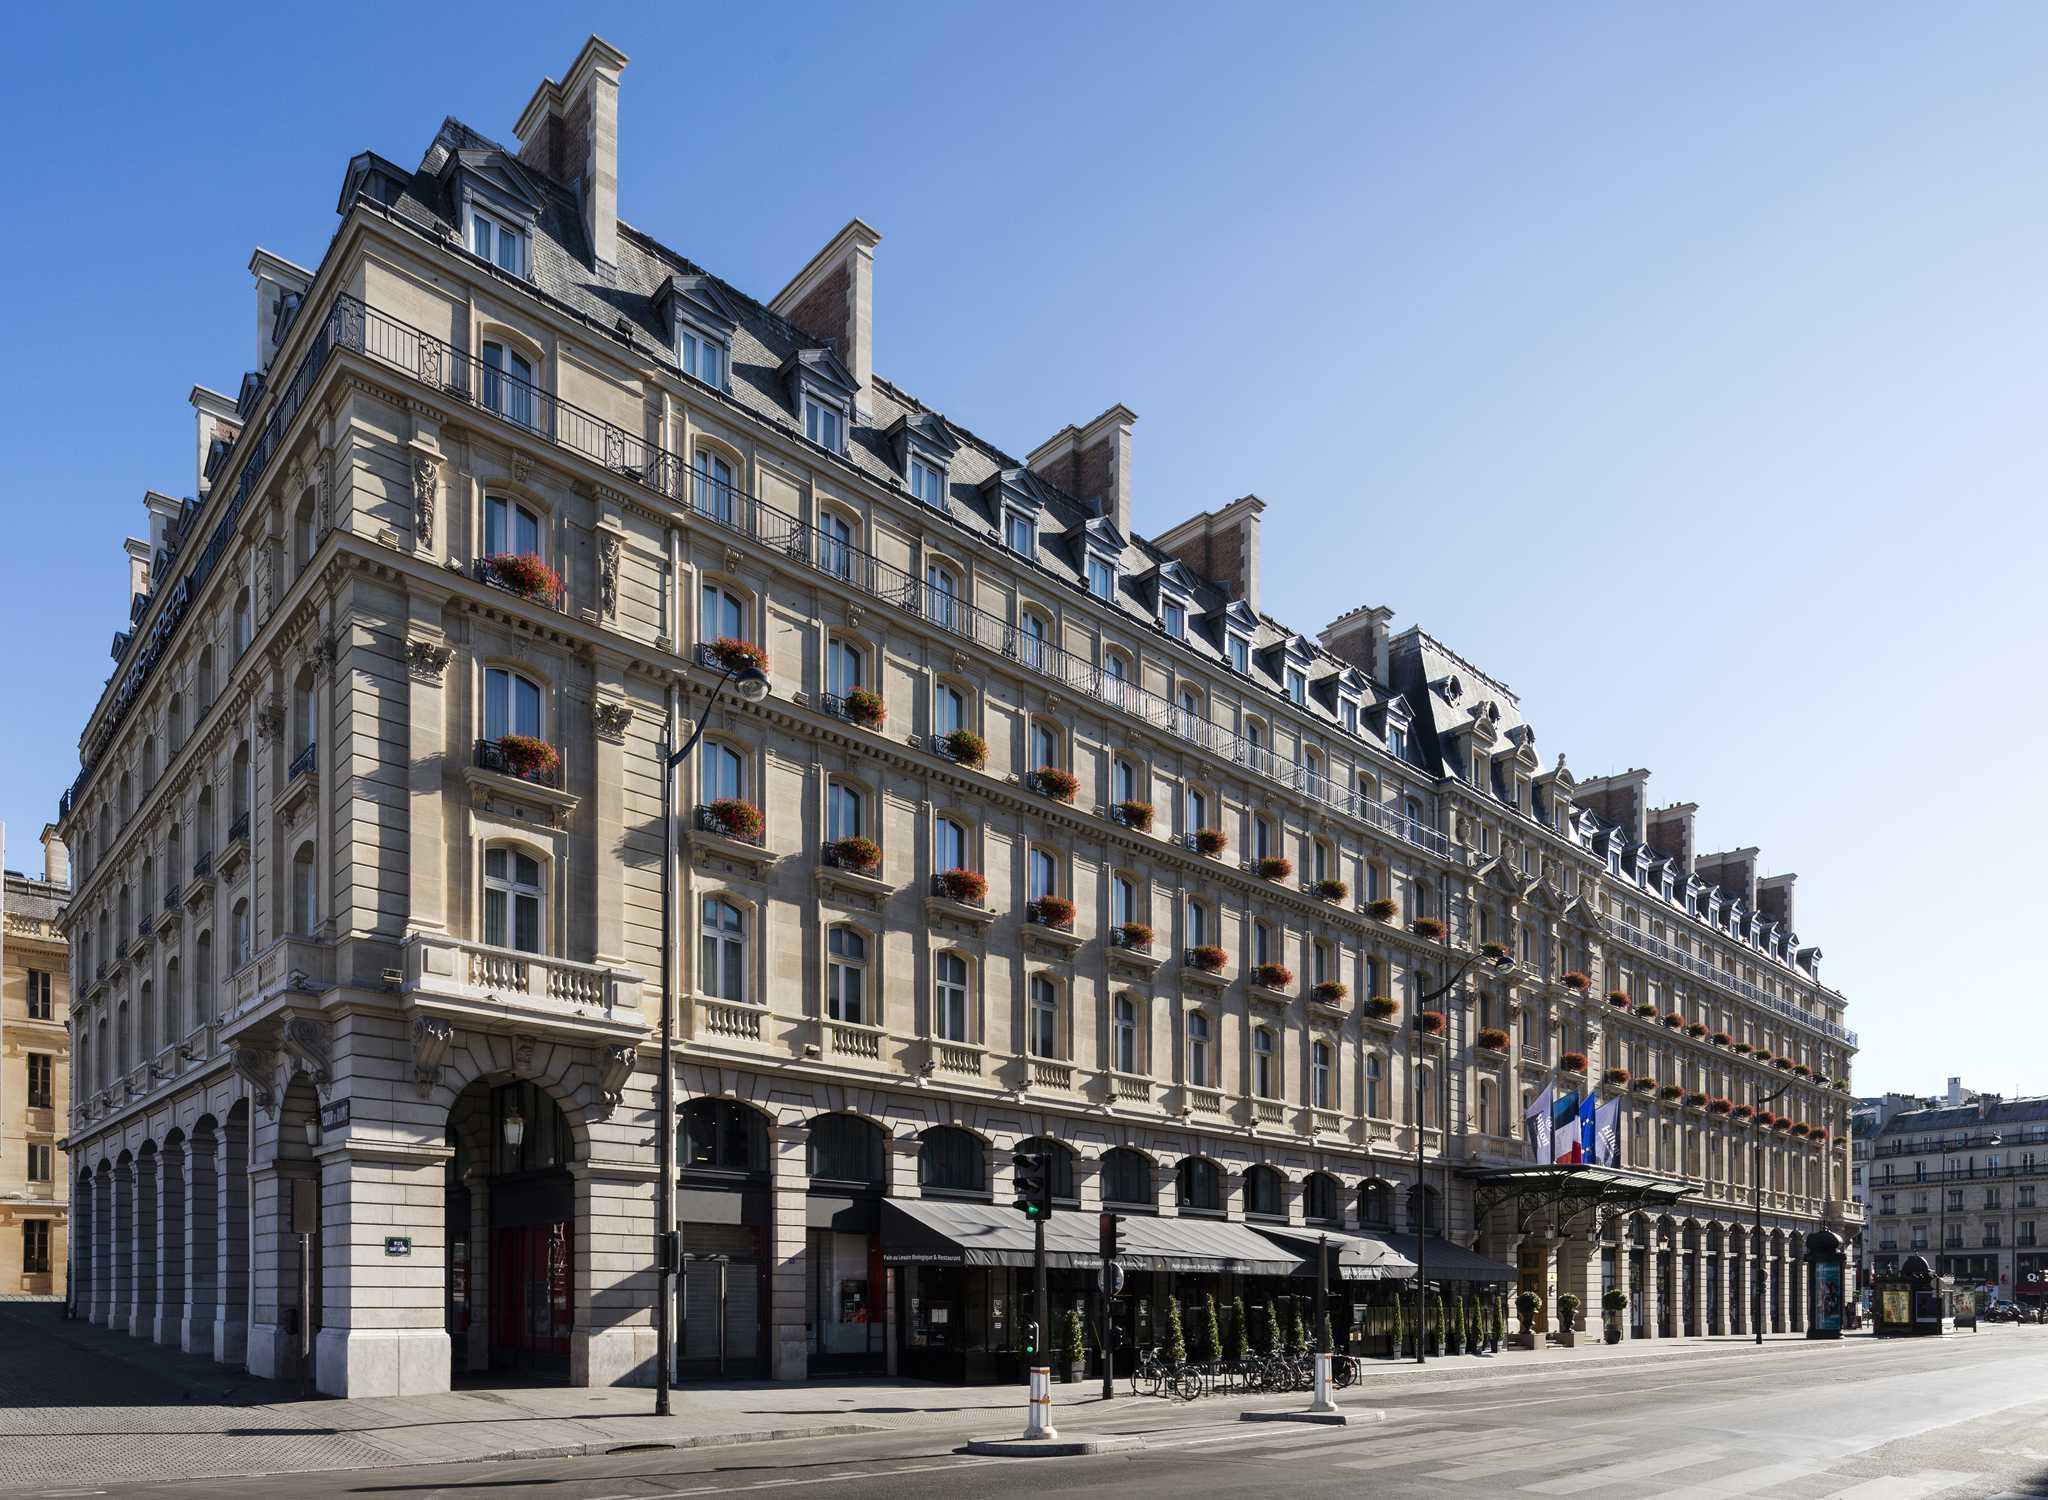 Hilton hotels resorts frankreich for Frankreich hotel paris